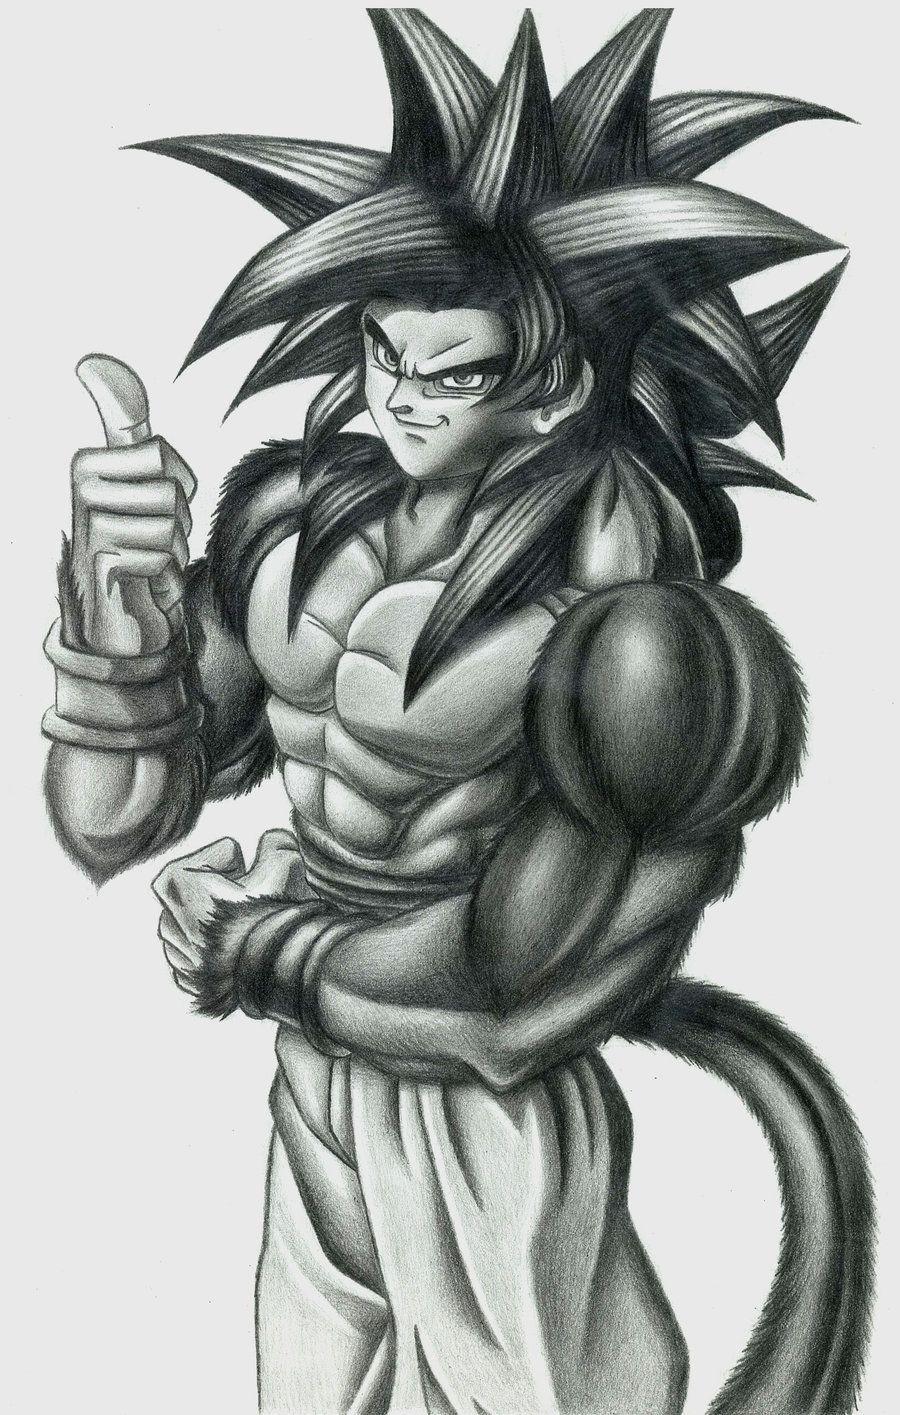 Pin De Pablo Arceles Silva En Dragon Ball Goku A Lapiz Imagenes De Goku Dibujo De Goku